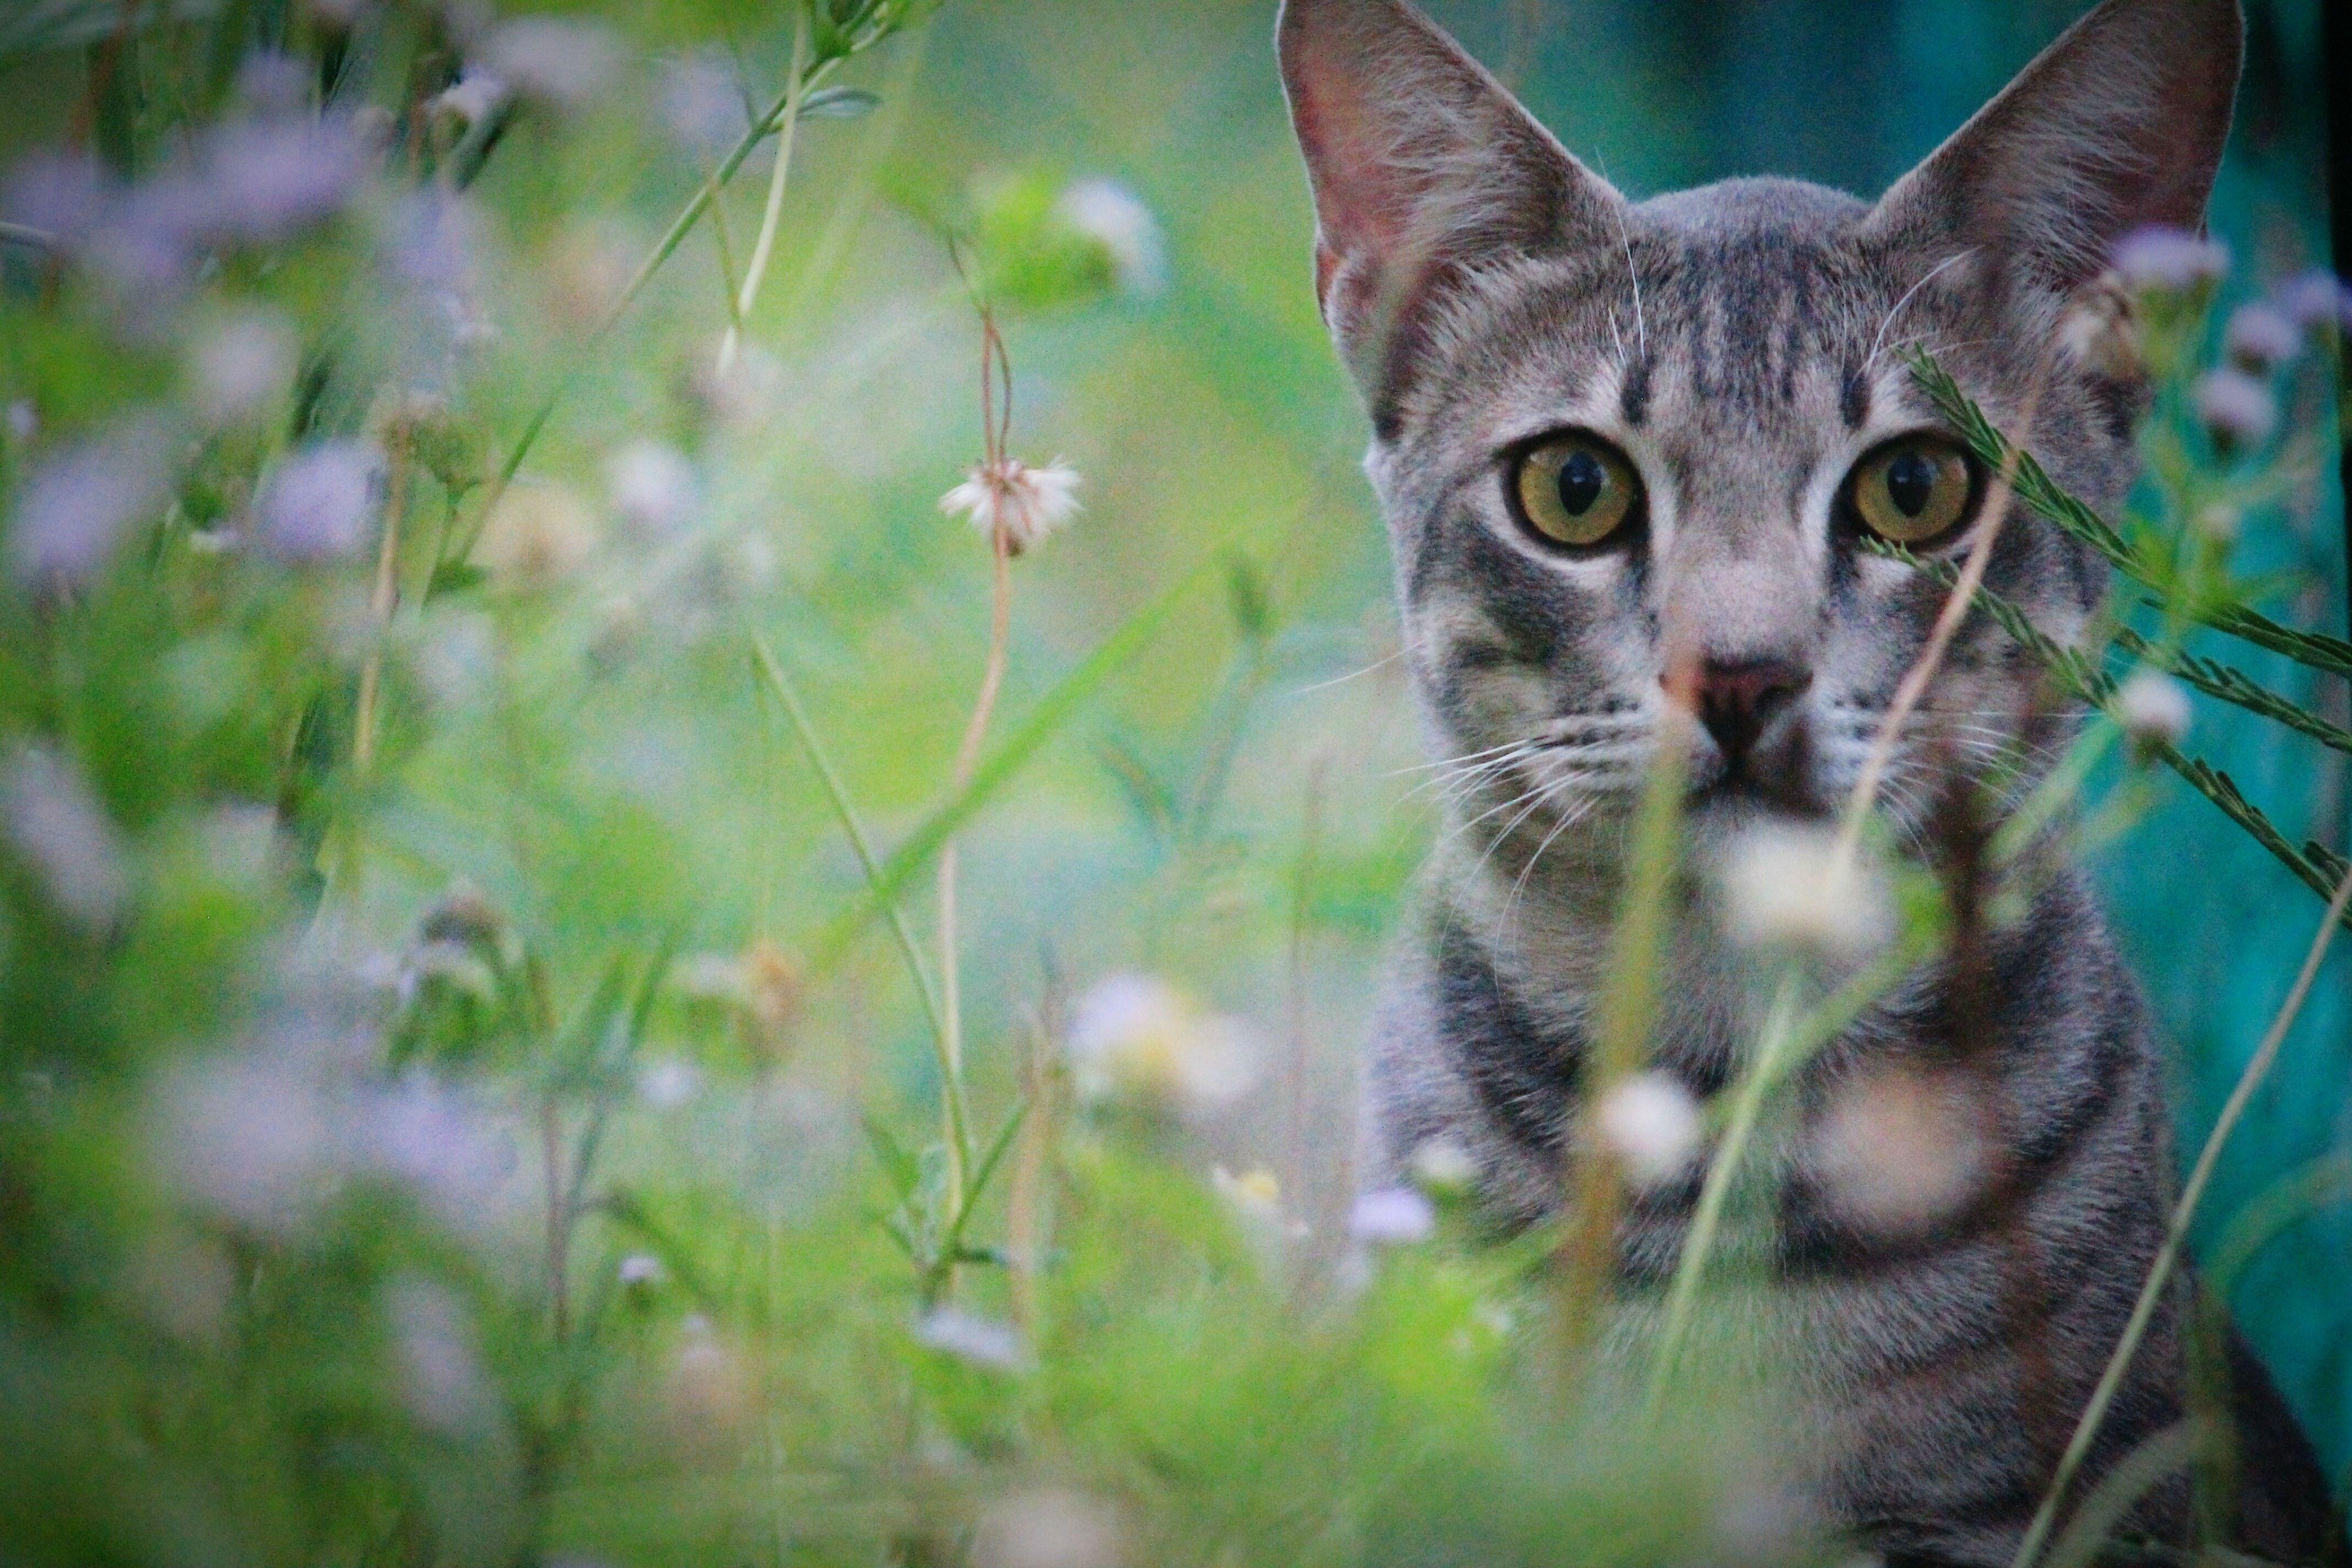 Domestic cat outside among the plants.